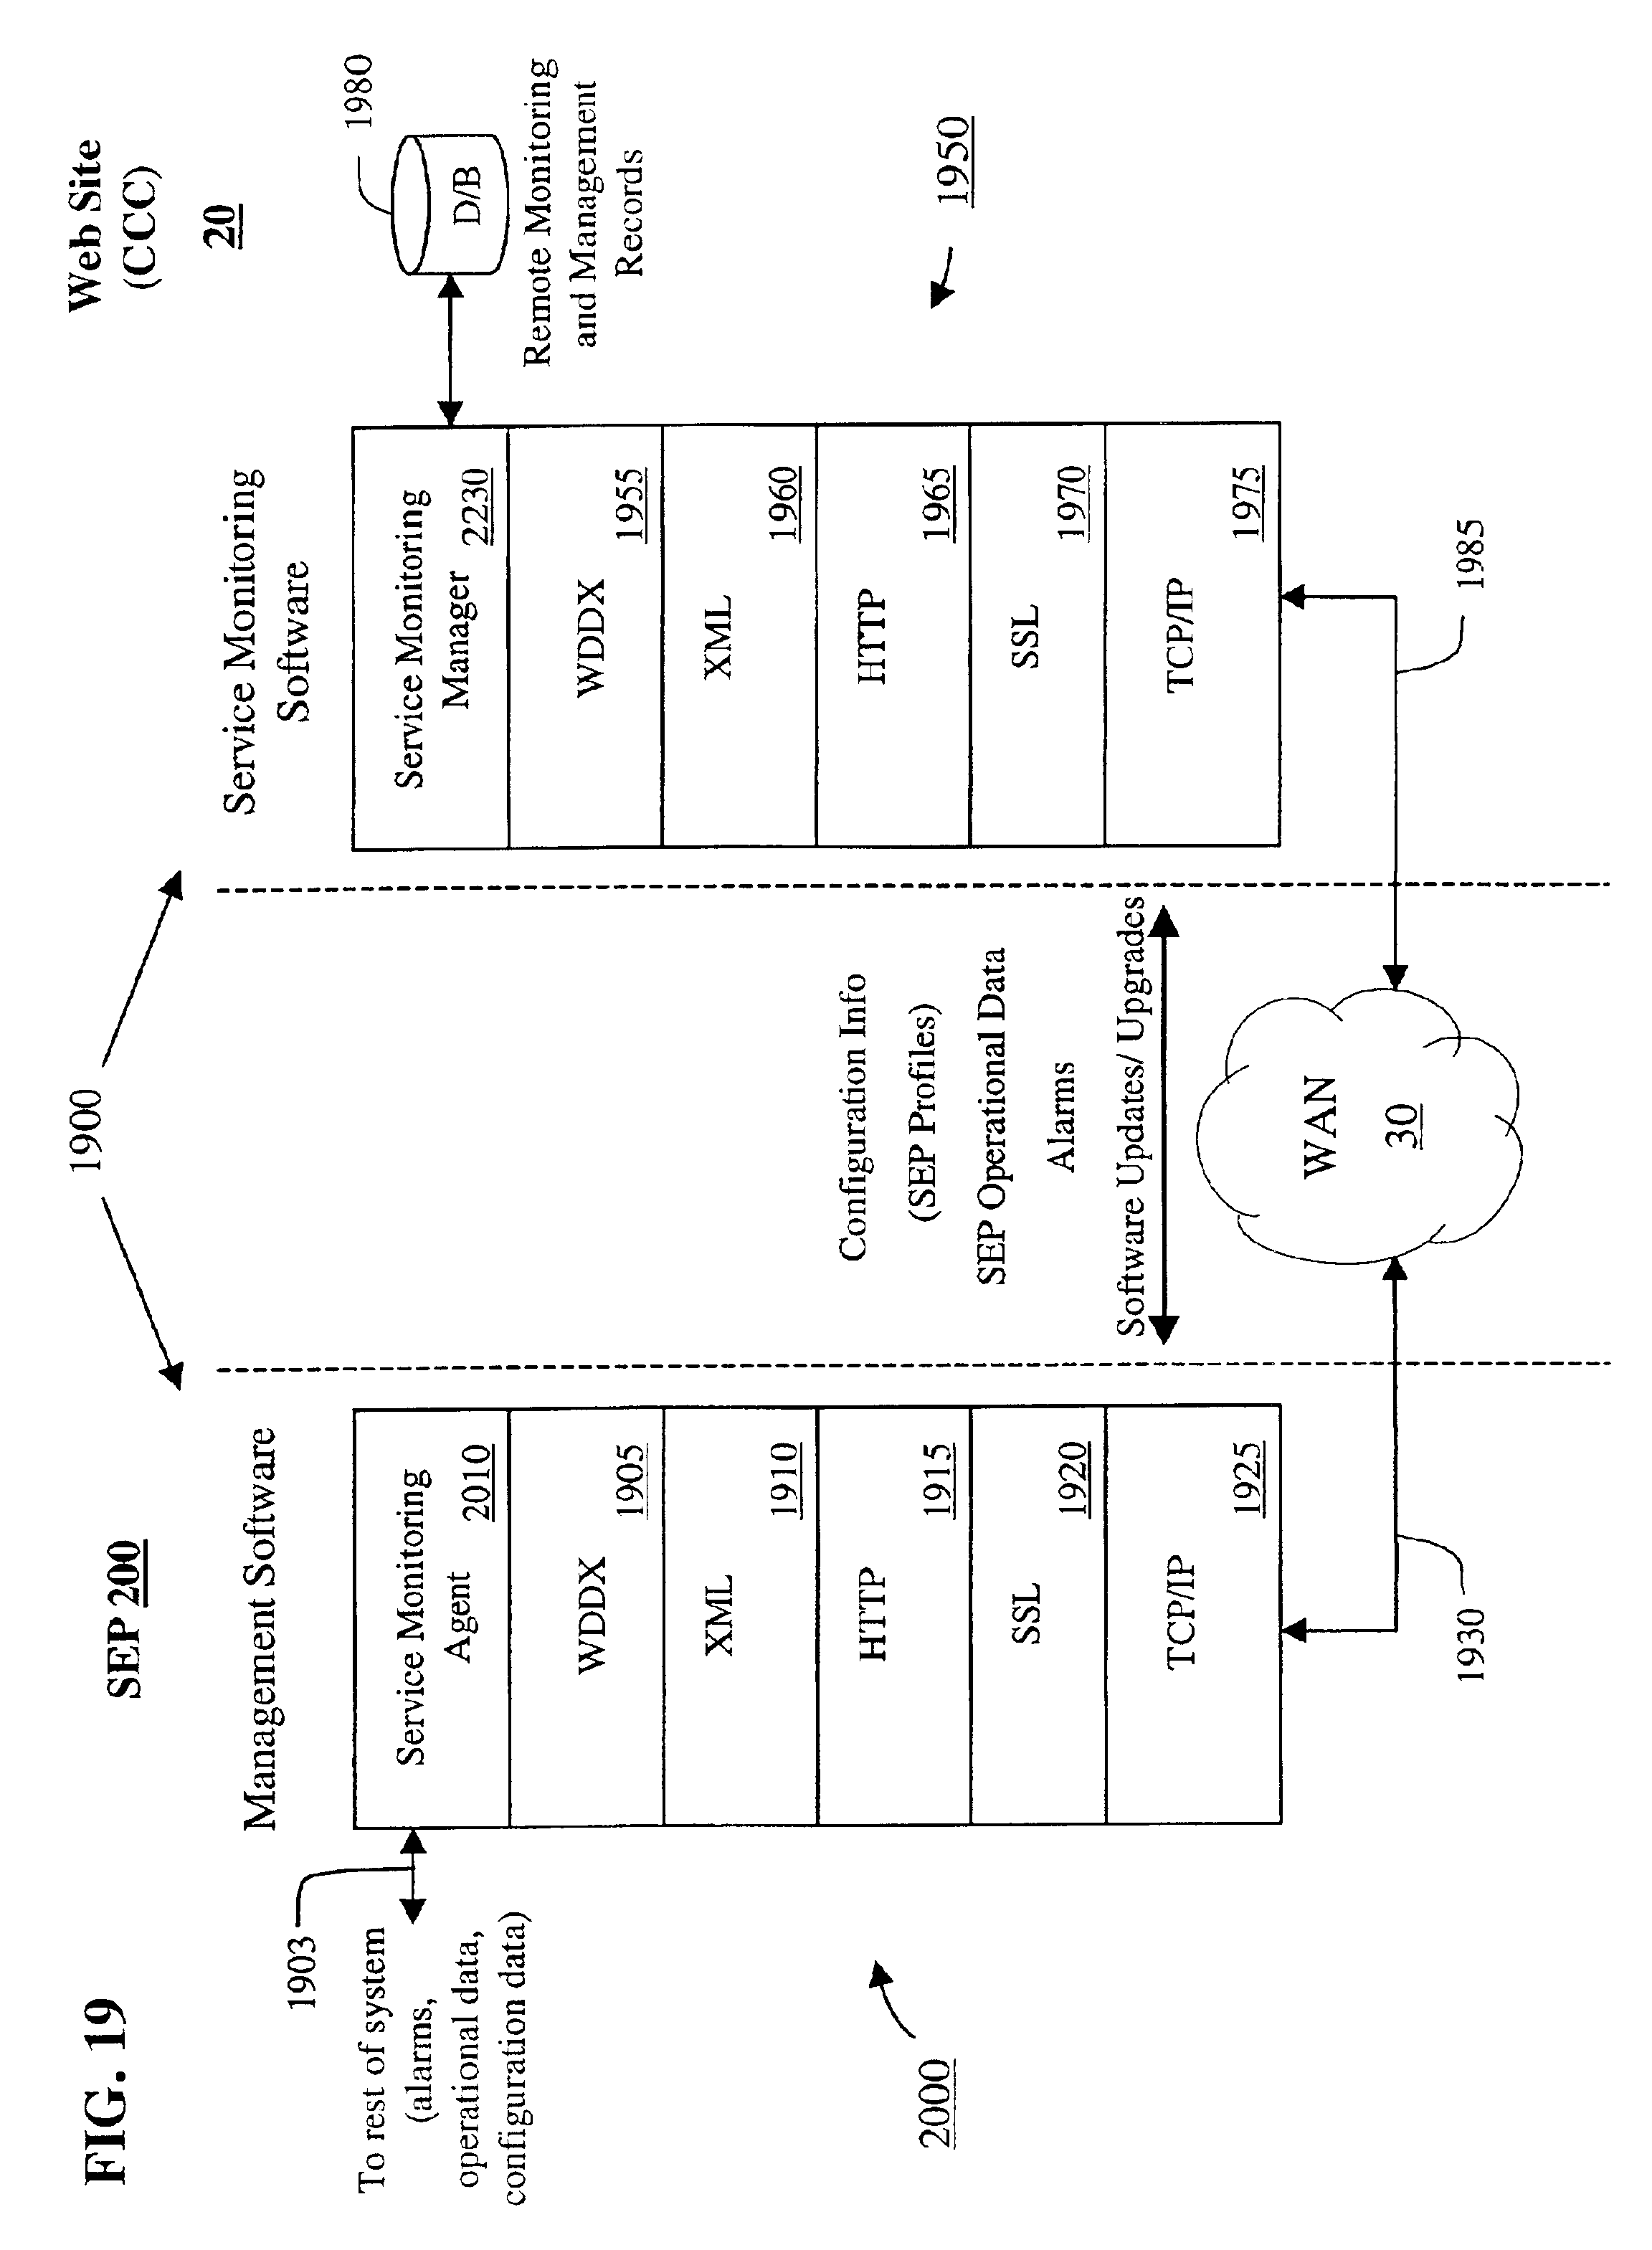 Patent US 6,920,502 B2